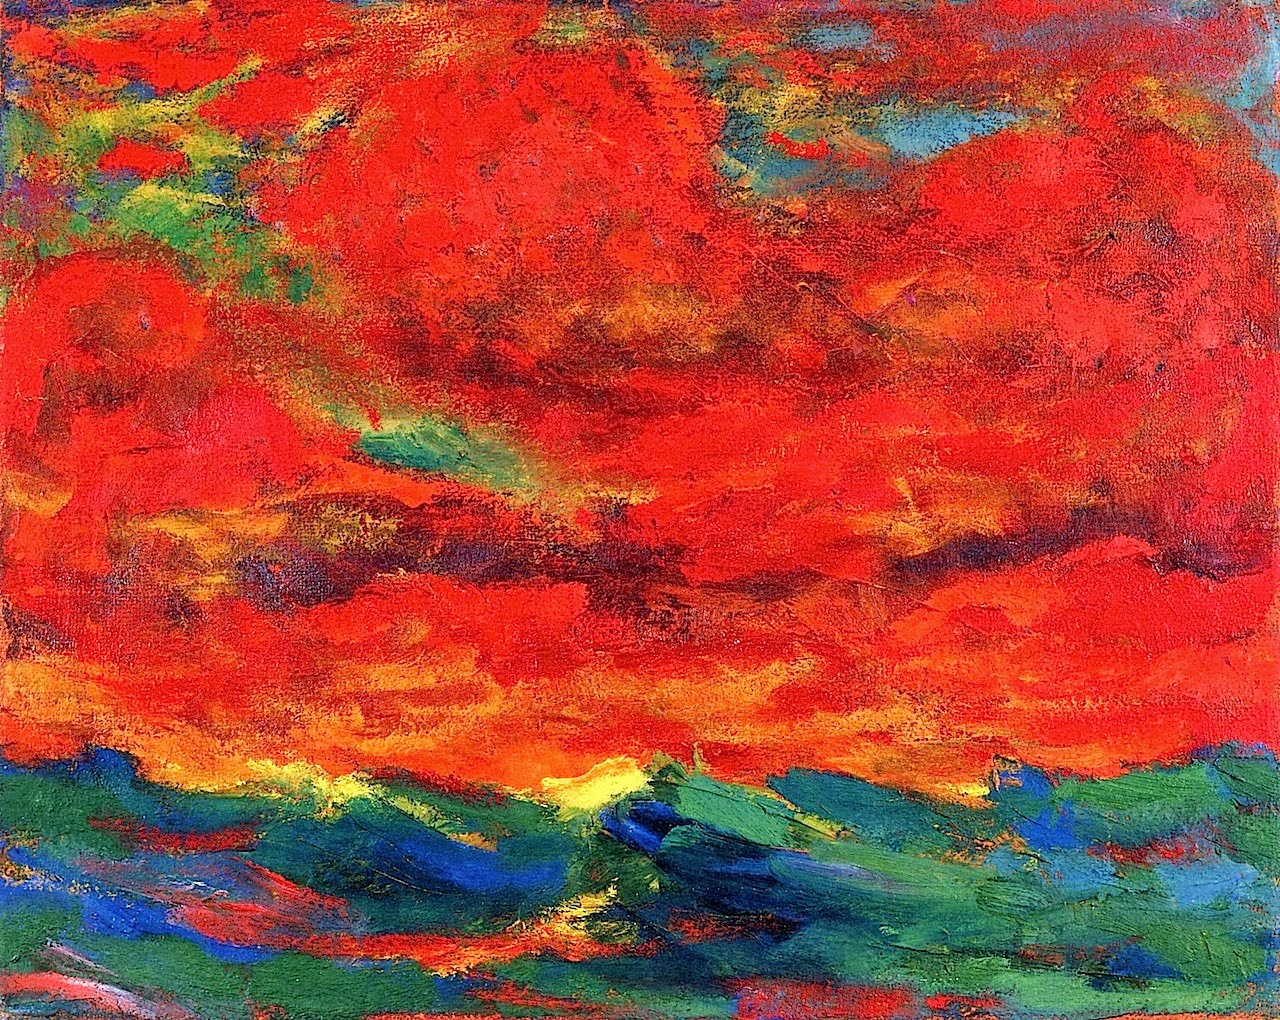 German-Expressionism-Emil-Nolde-A-Long-Time.jpg